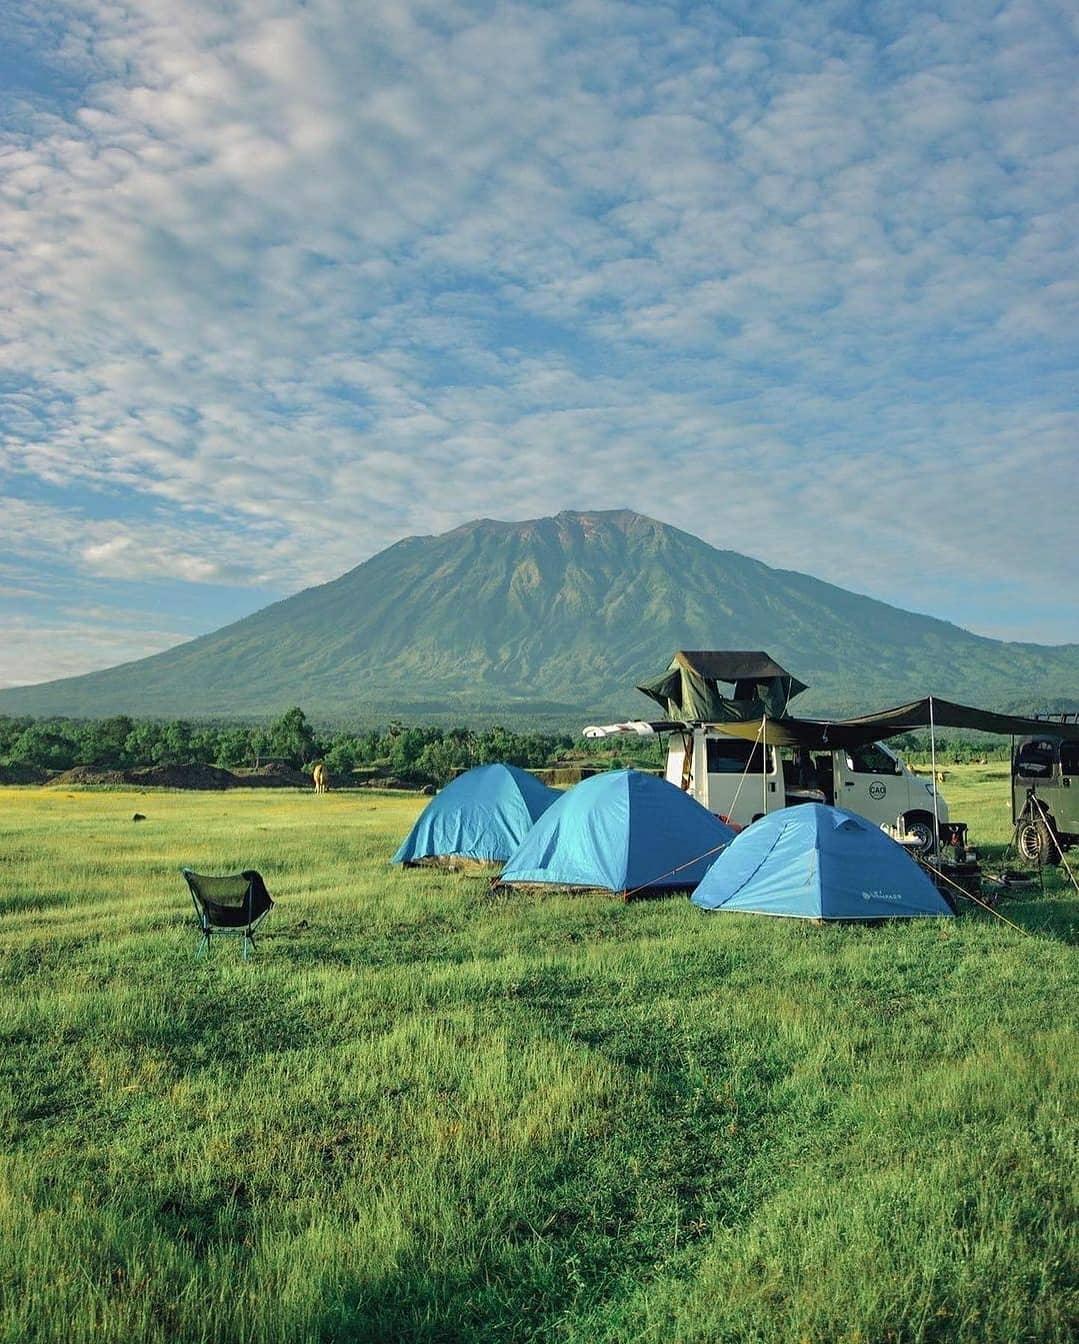 Camping Di Savana Tianyar Bali Image From @akbarhendar